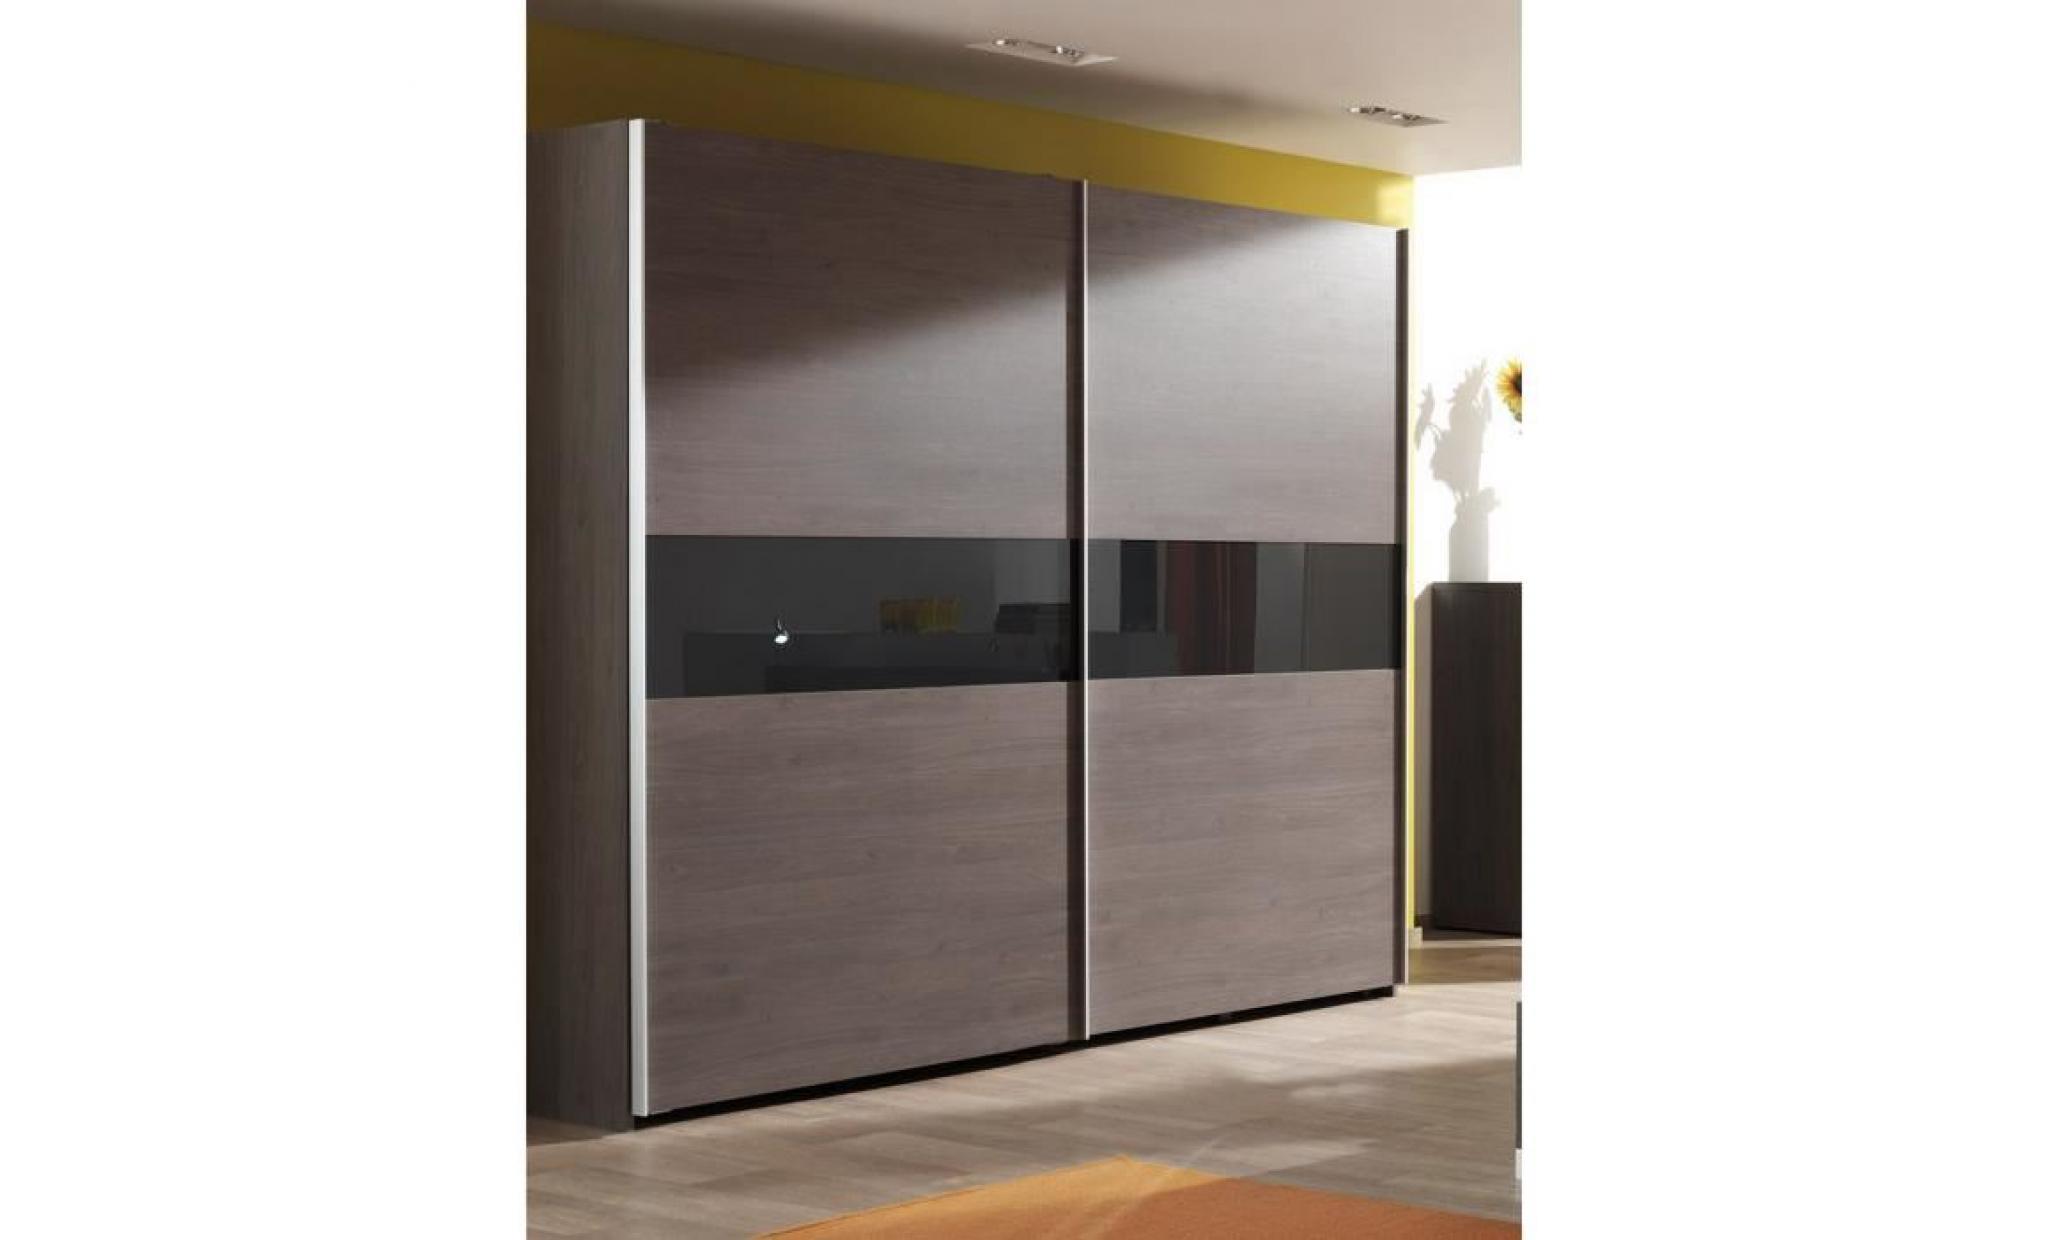 armoire bois porte coulissante armoire classique en bois porte coulissante fly armoire porte. Black Bedroom Furniture Sets. Home Design Ideas